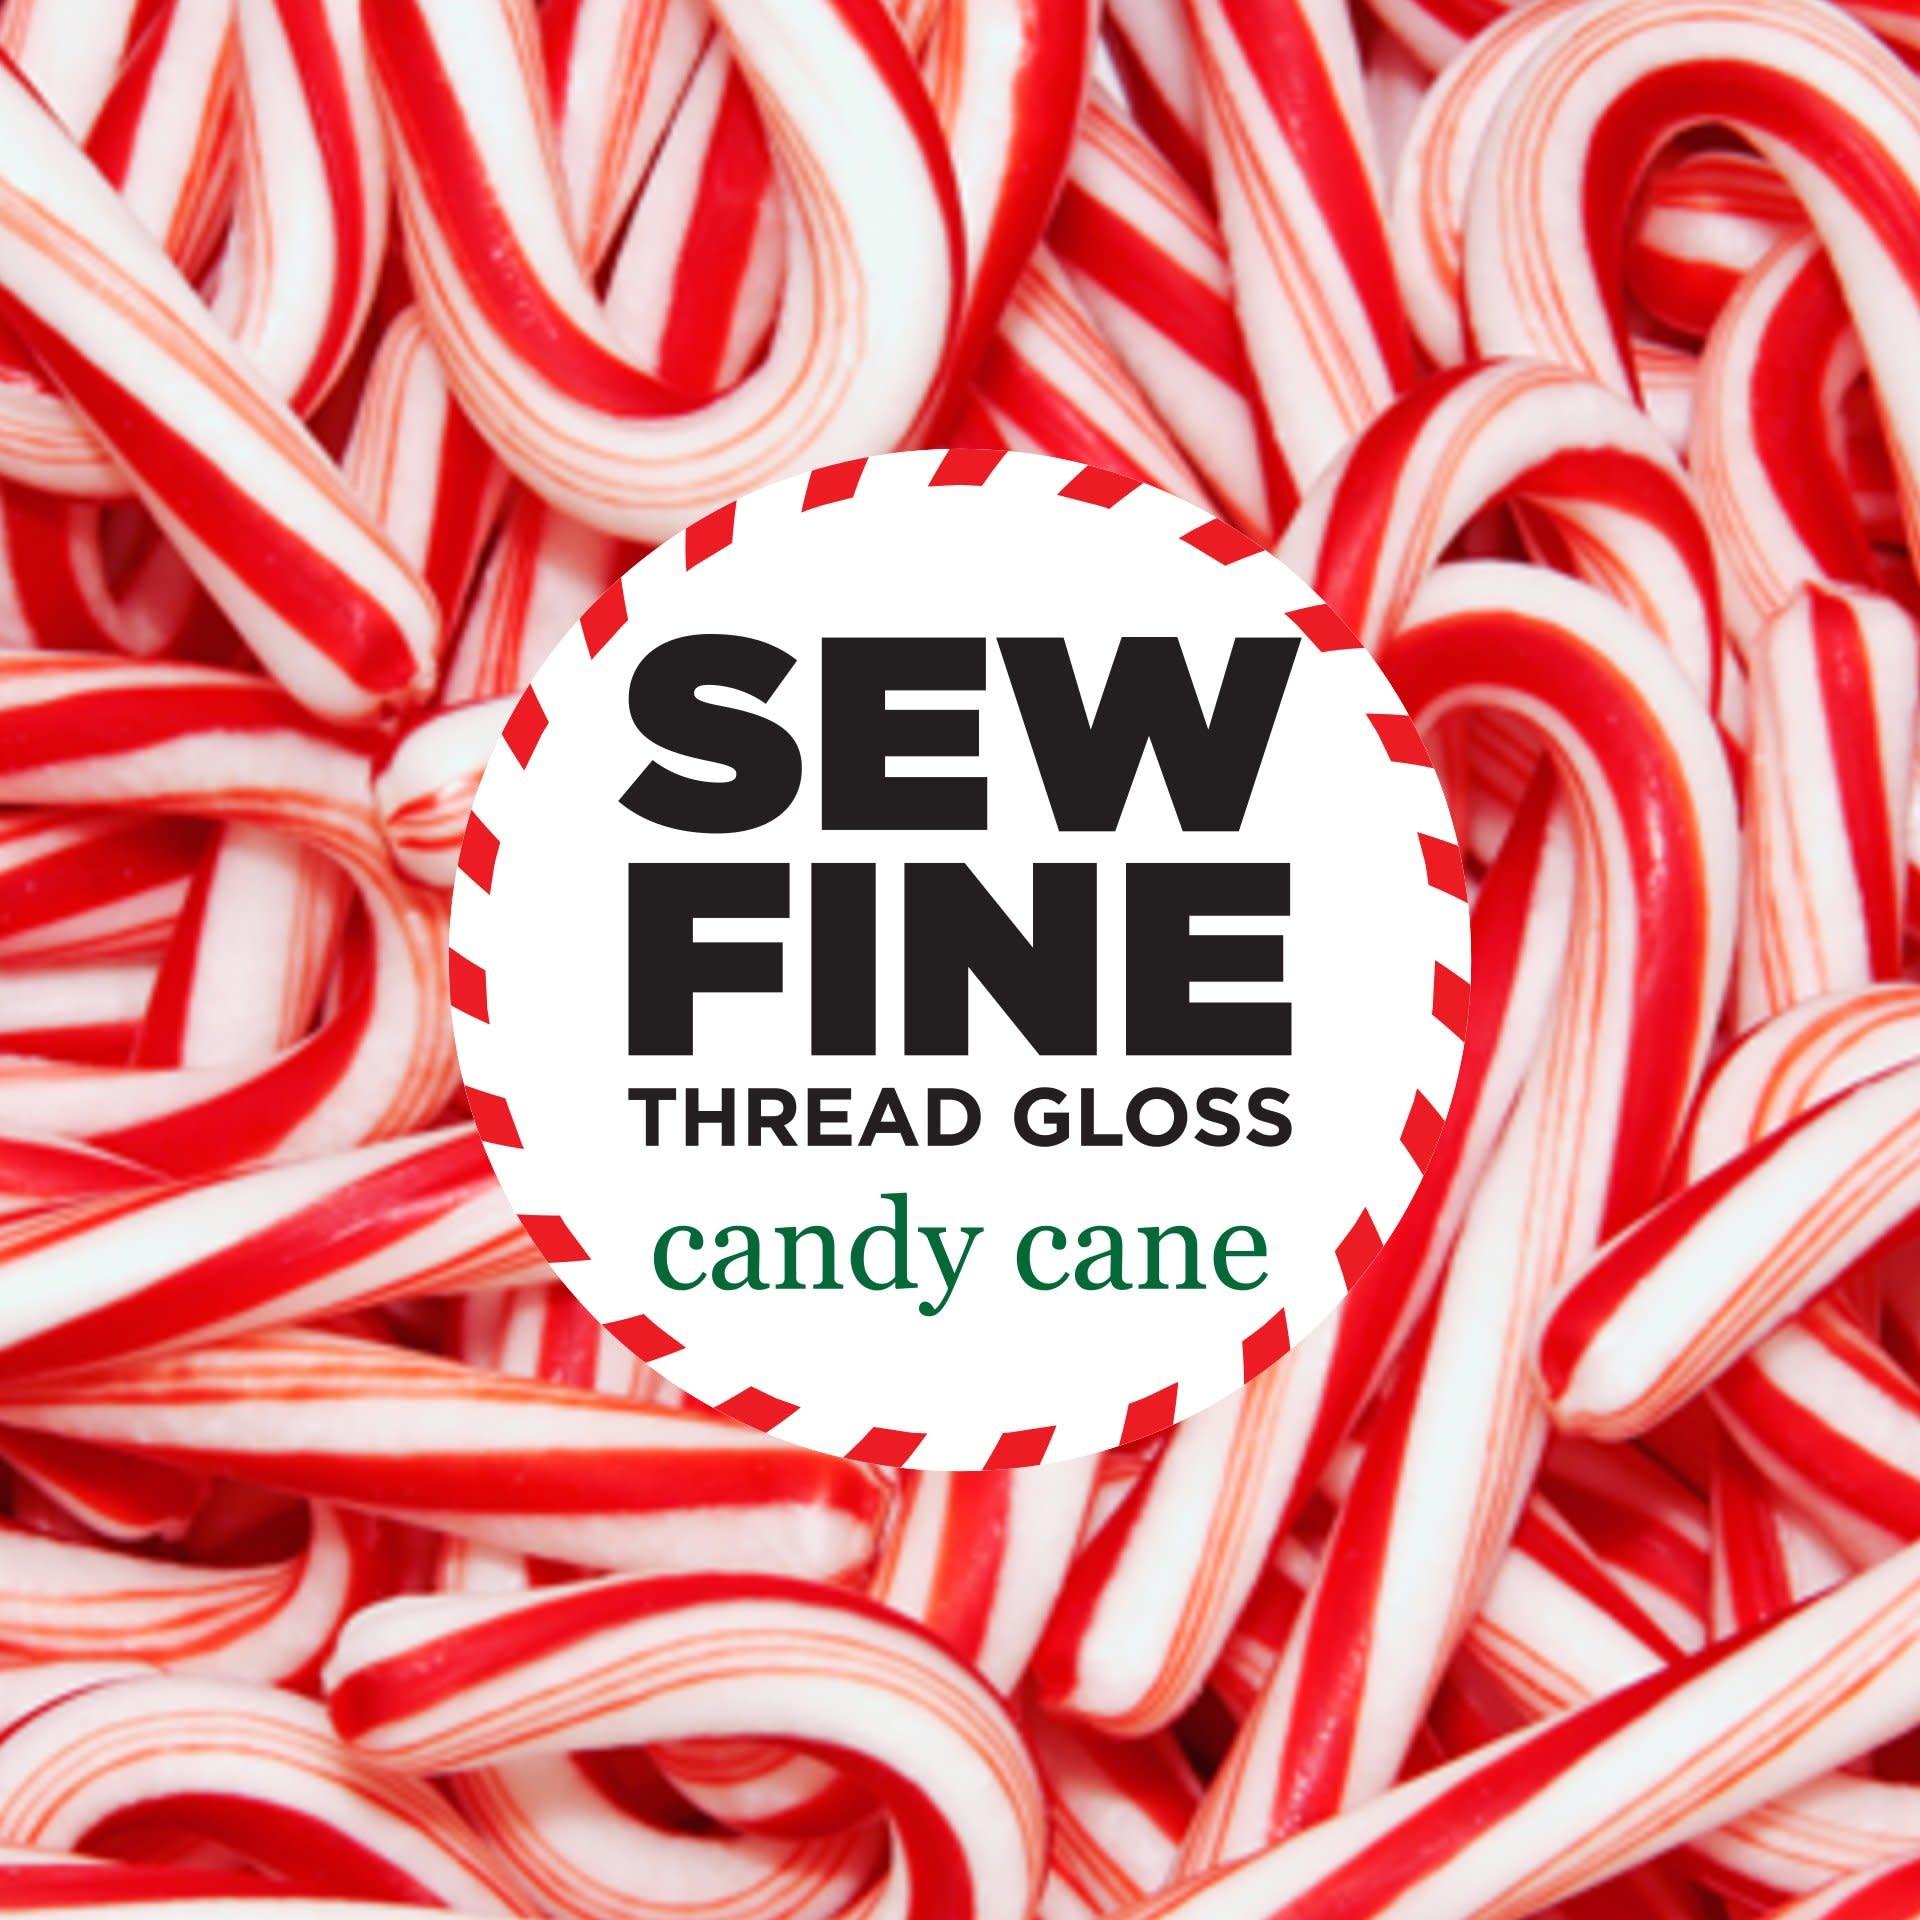 Sew Fine Sew Fine Thread Gloss: Candy Cane 0.5 oz